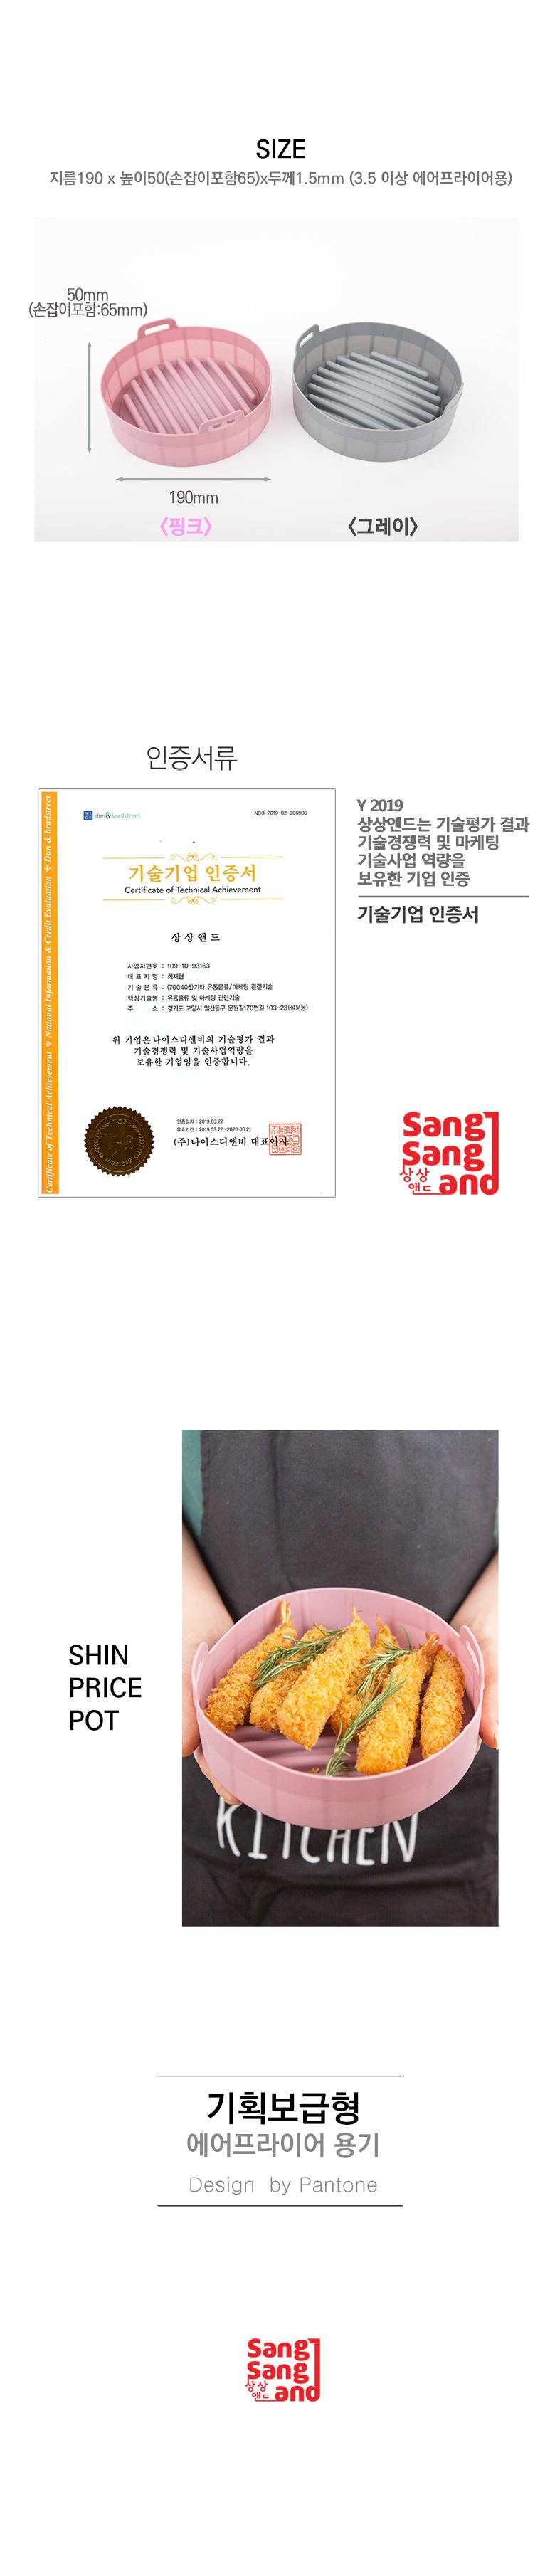 JJ-28 기획보급형 로즈핑크 대 + 대 - 상상앤드, 17,900원, 조리도구, 아이디어 조리도구